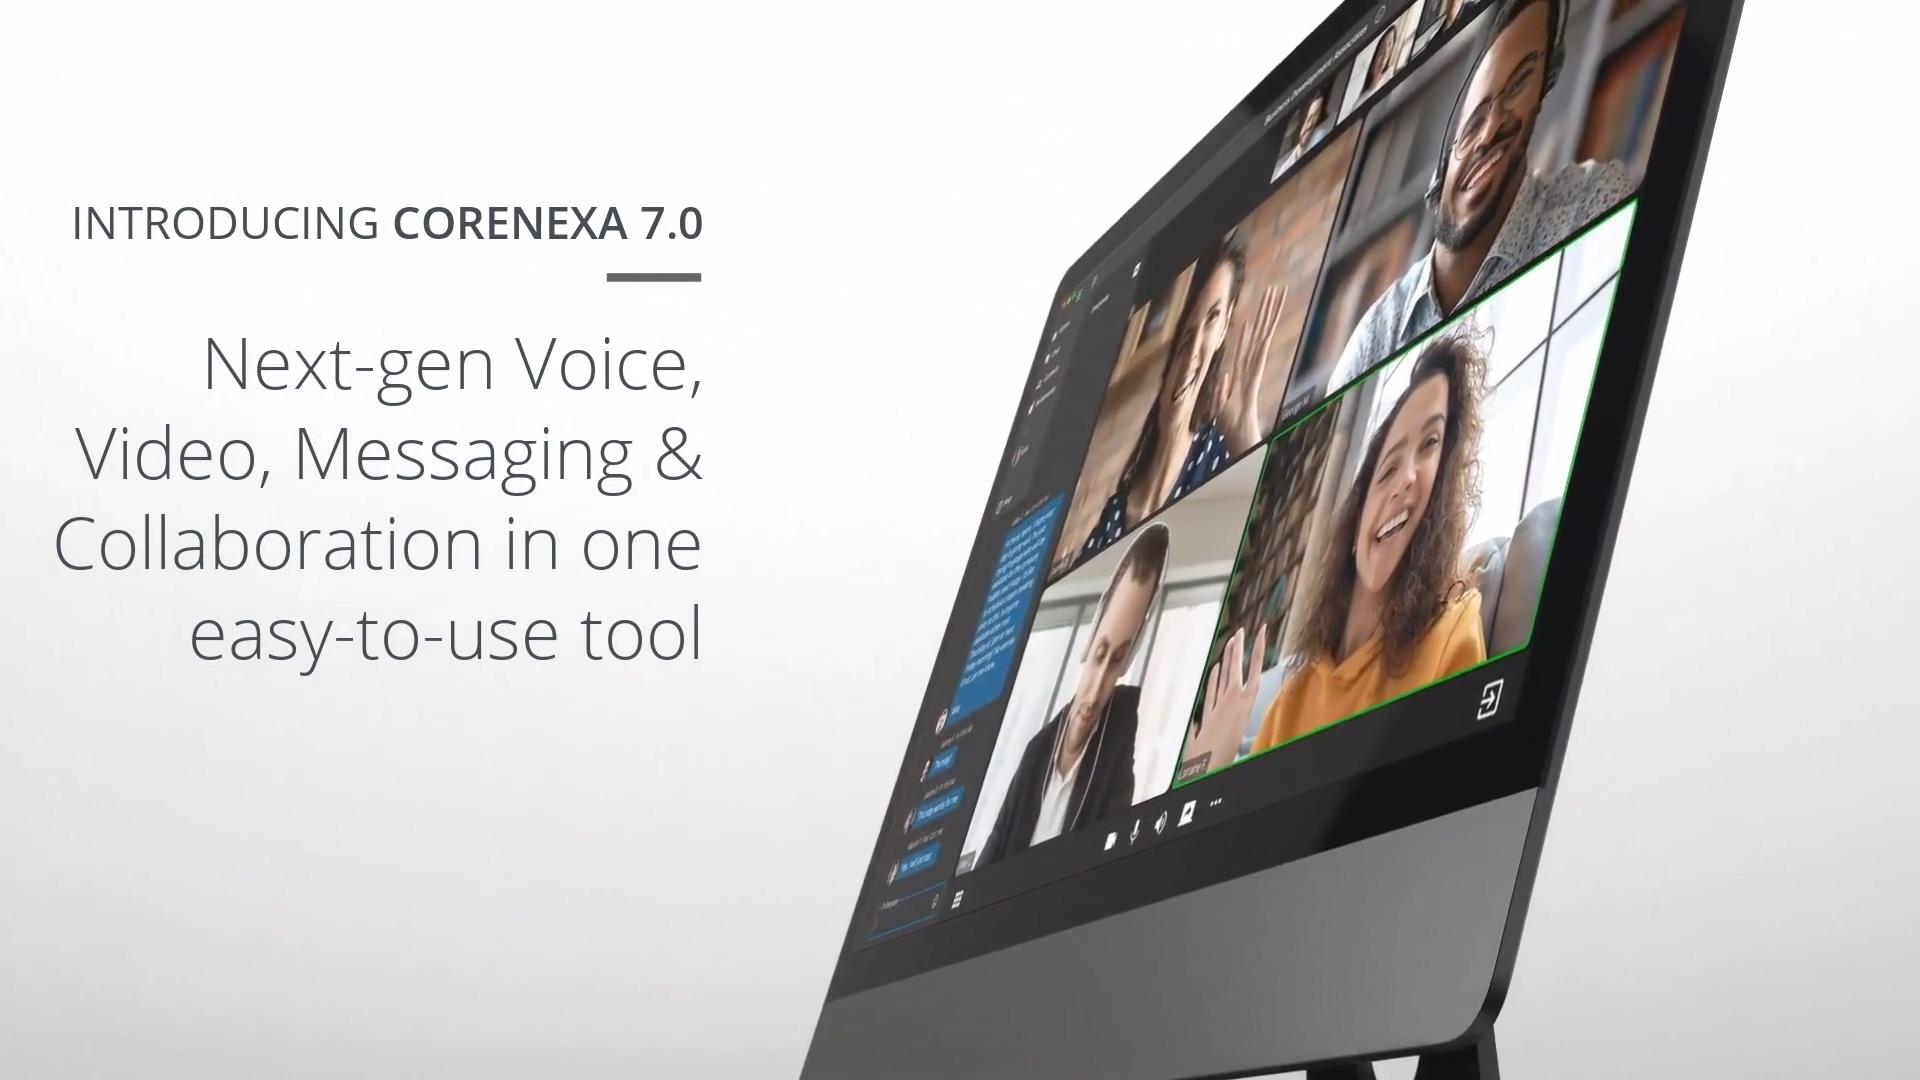 CoreNexa 7.0 Commercial Video